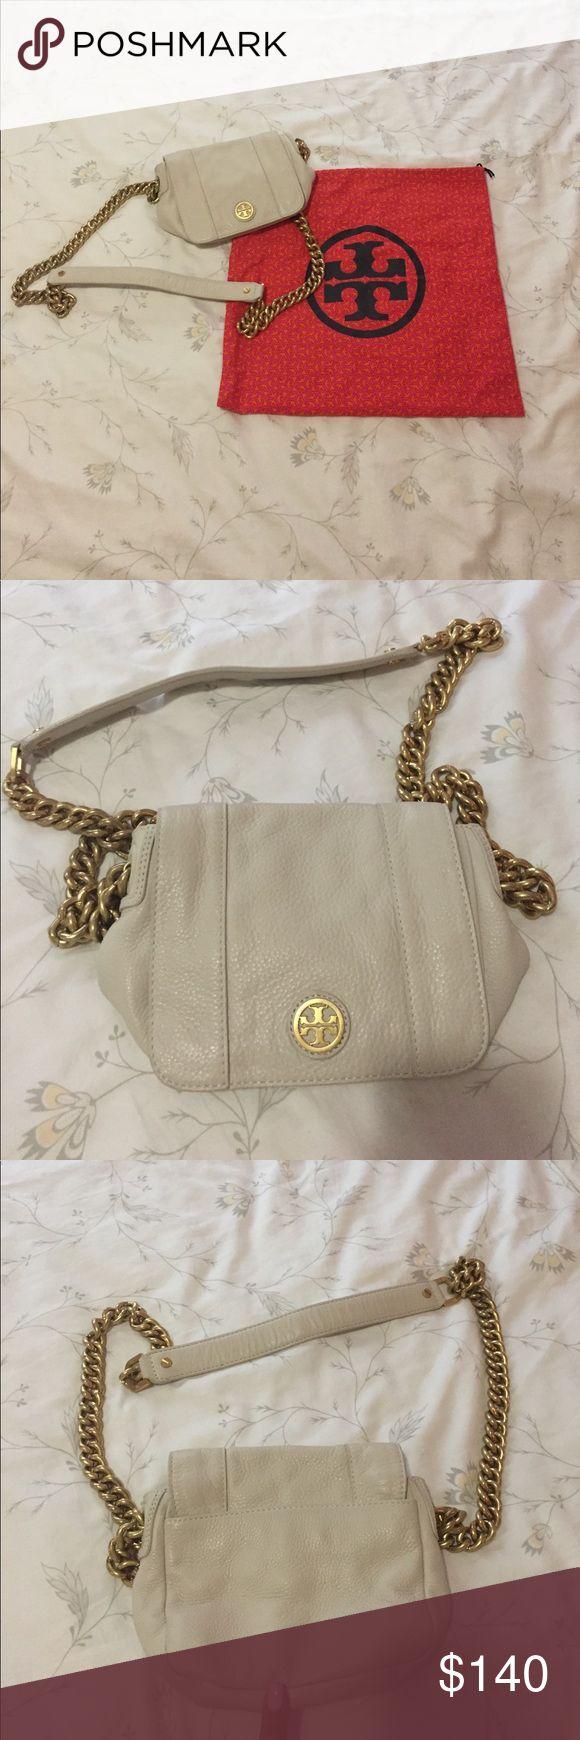 Tory Burch Cream Shoulder Bag w/ Chain Tory Burch Cream Shoulder Bag w/ Chain Tory Burch Bags Shoulder Bags